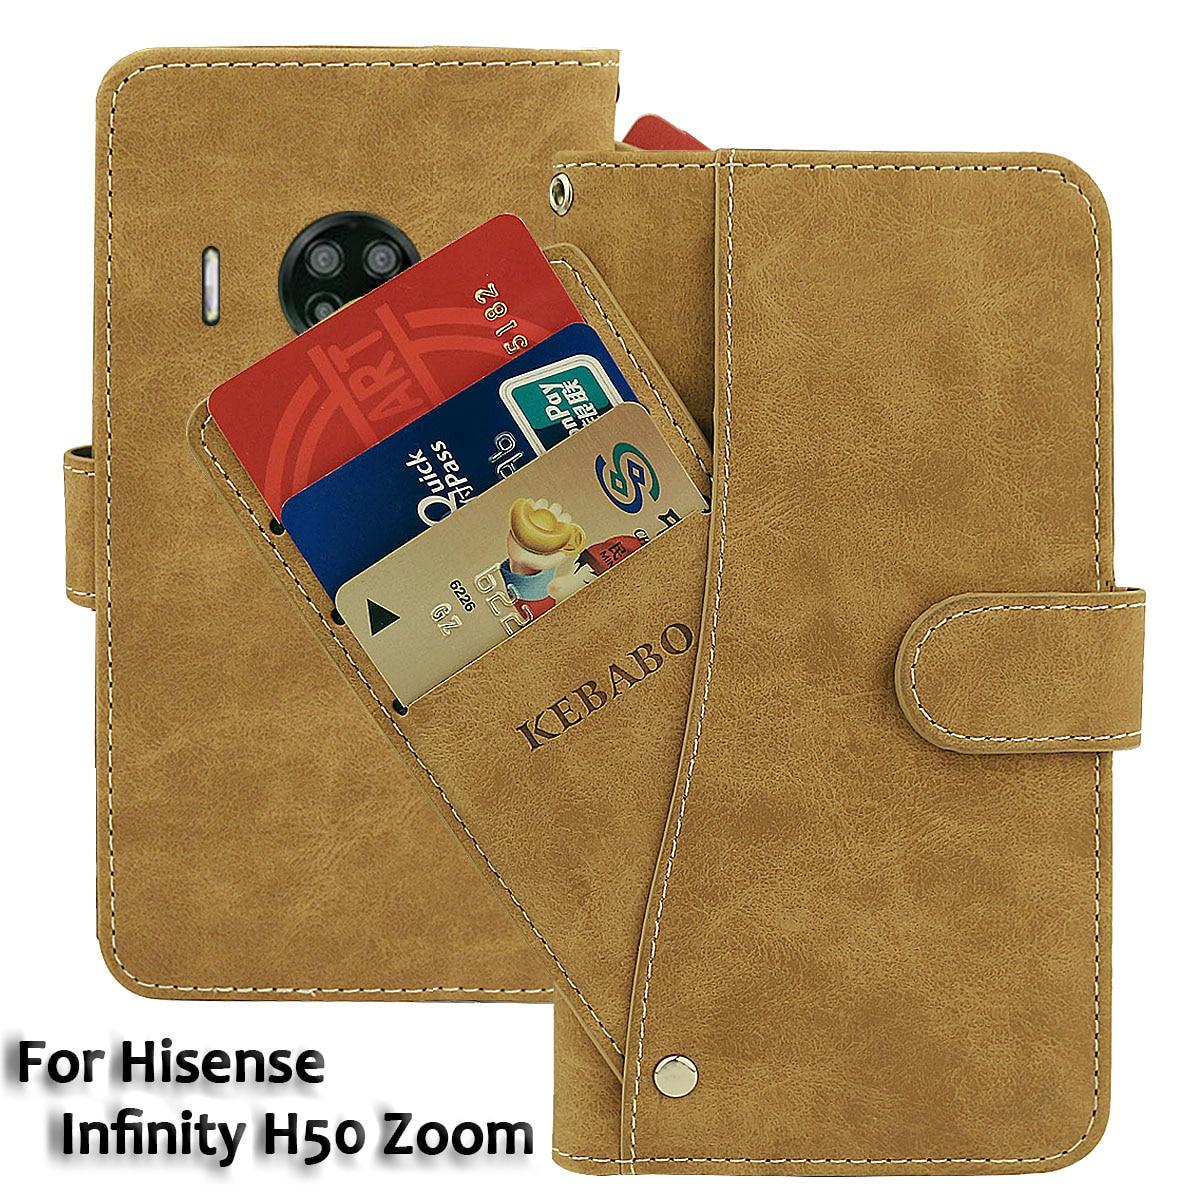 Vintage Leather Wallet Hisense Infinity H50 Zoom Case 6.53